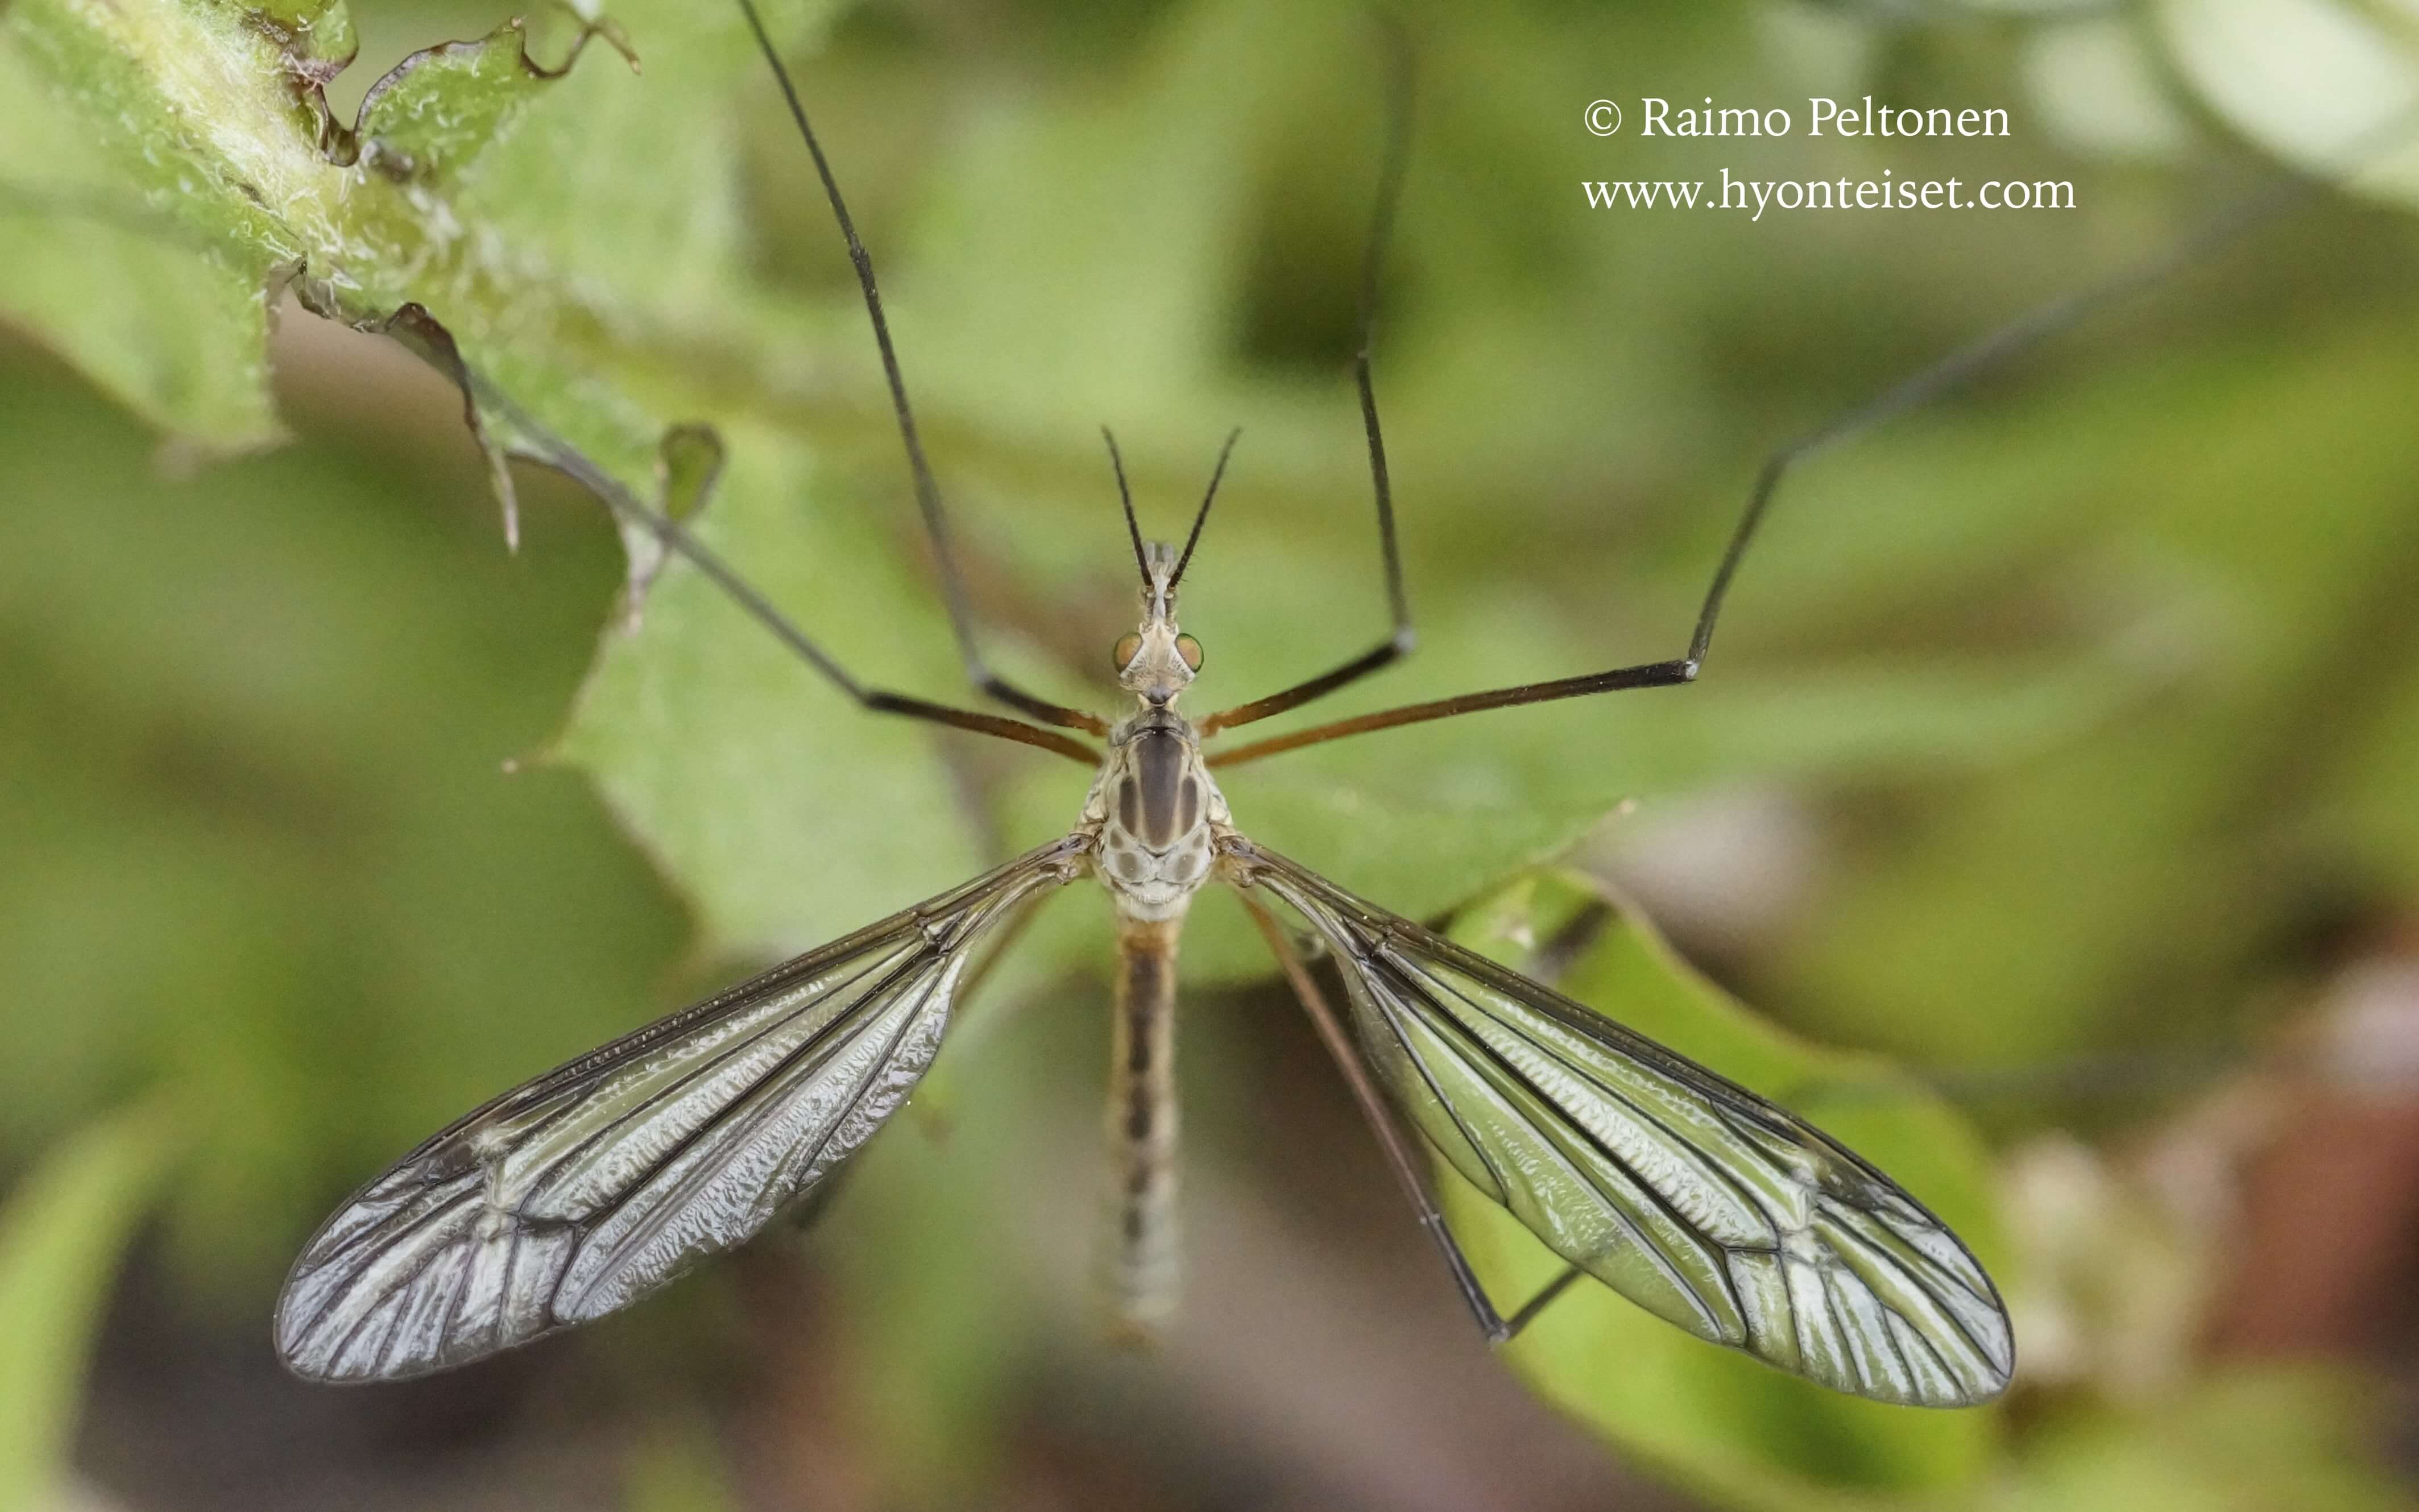 Tipula cf. vernalis (det. Esko Viitanen), 25.5.2015 Naantali